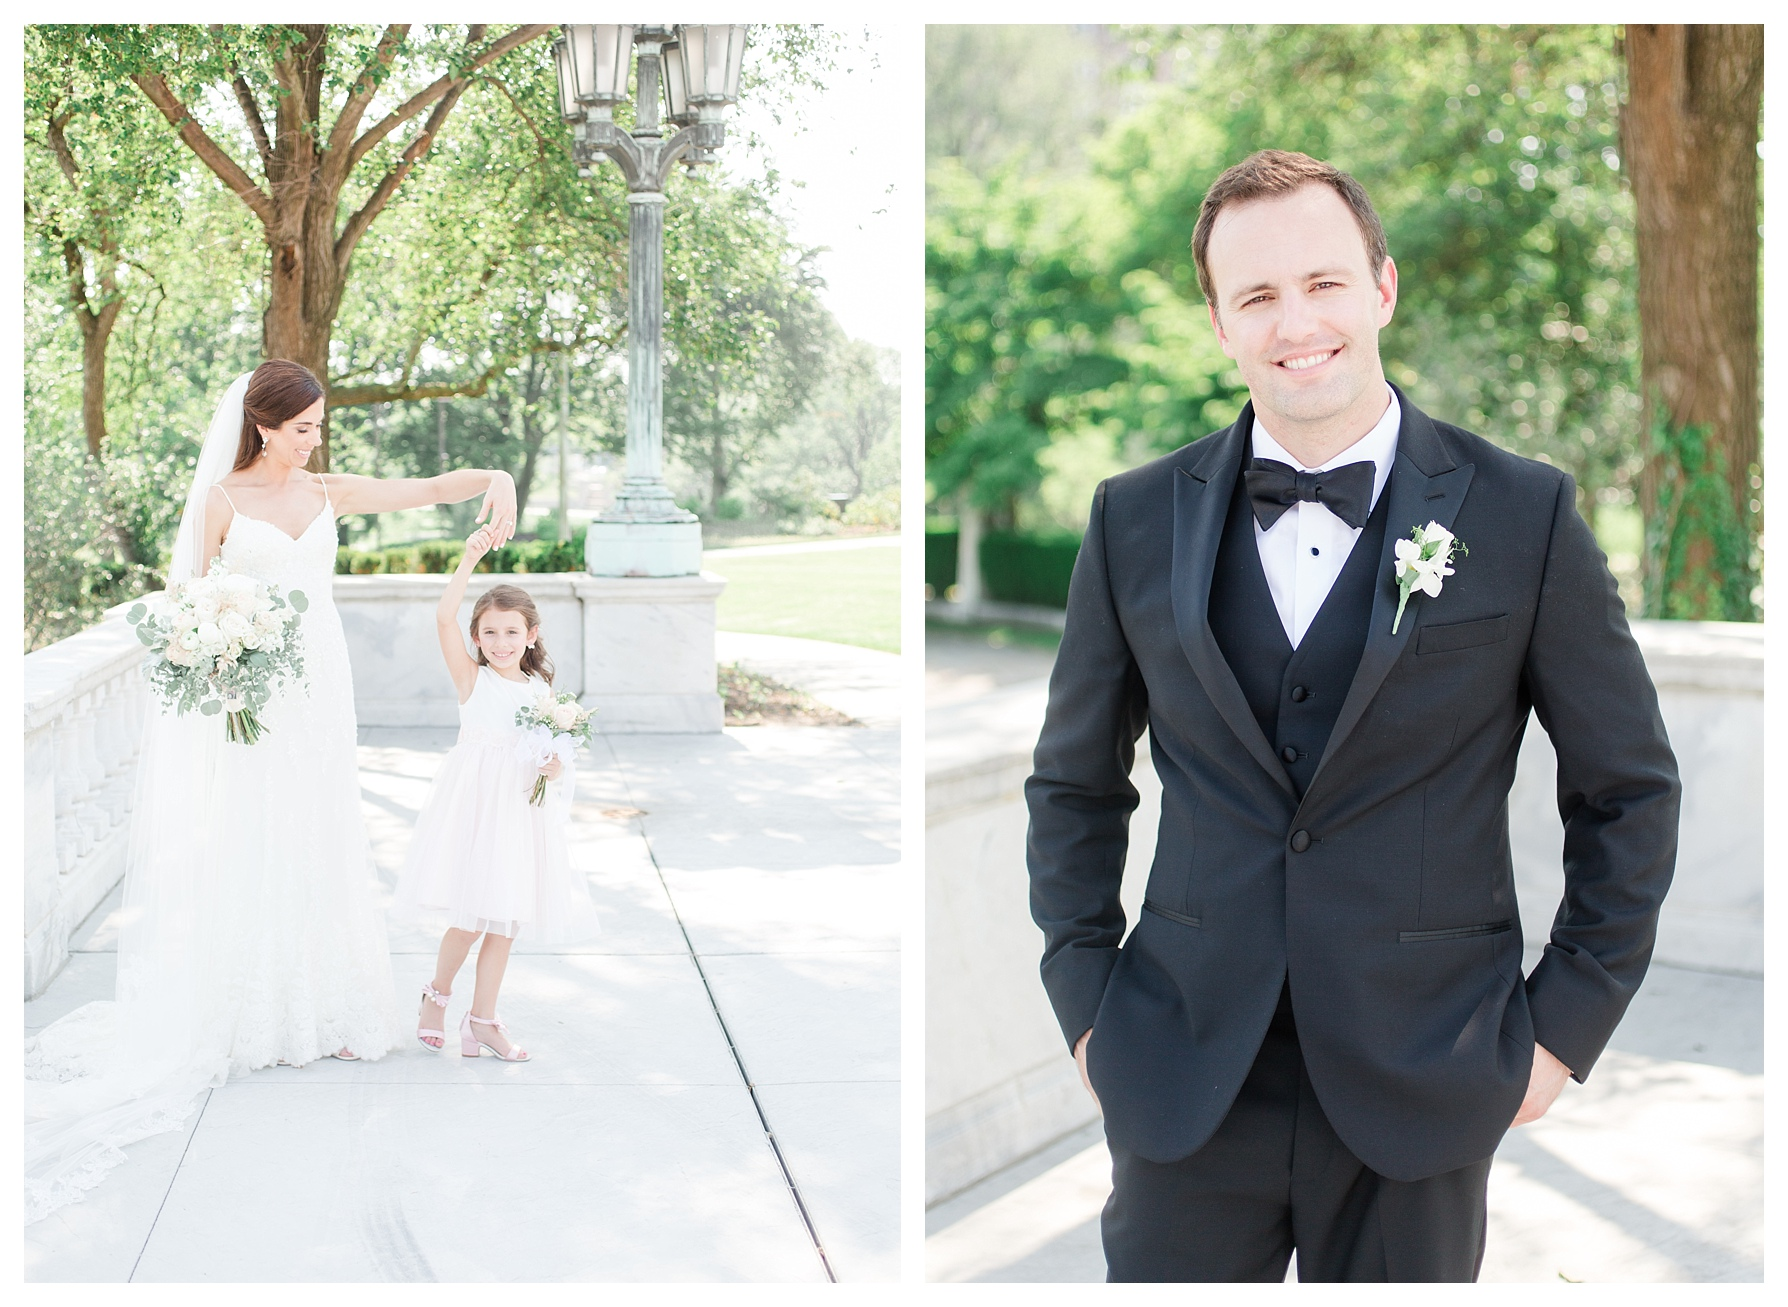 ritz-carlton-cleveland-wedding_0053.jpg